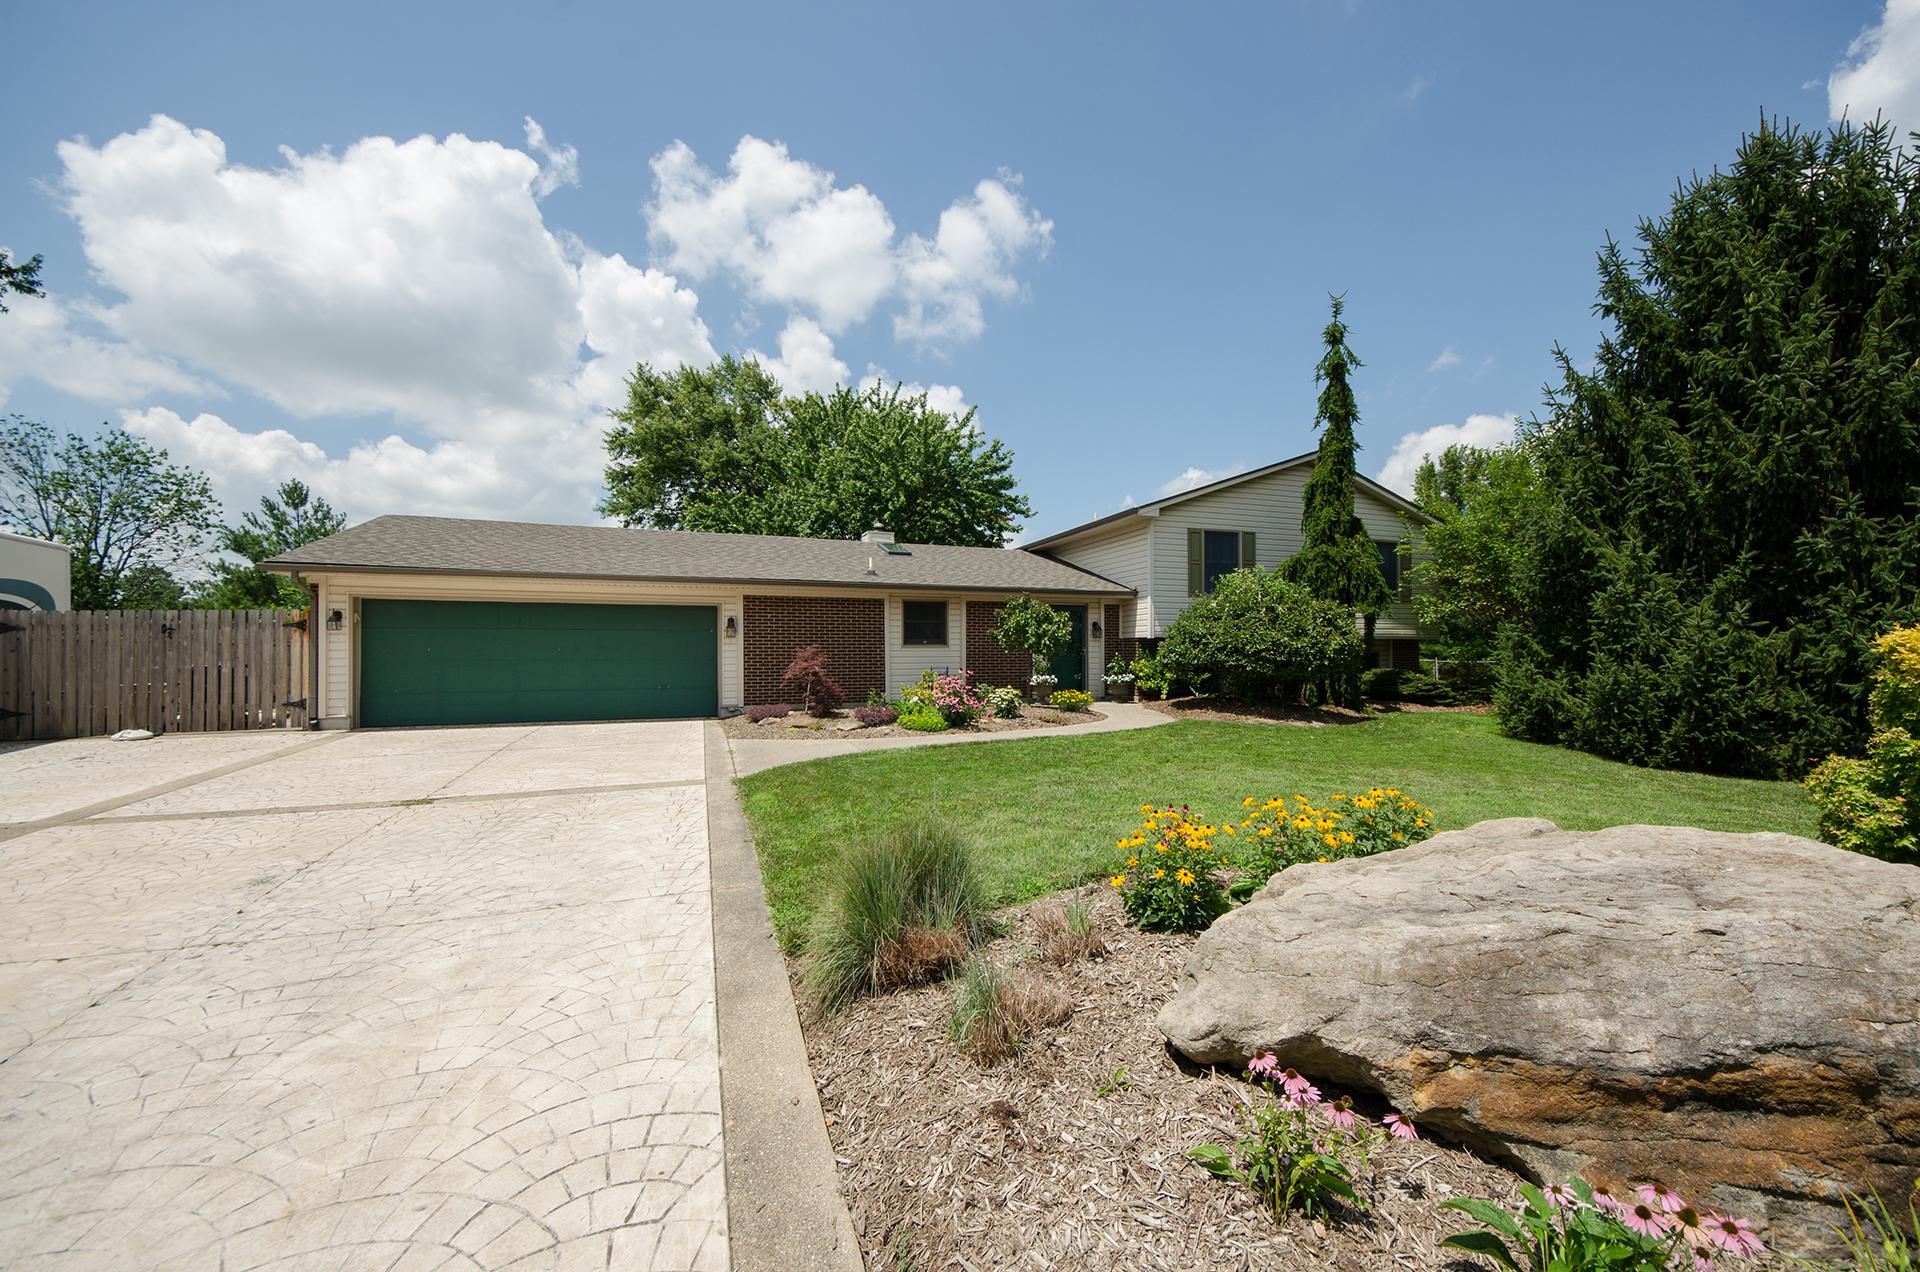 450 Island Lake Court   Dayton, OH - Design Homes